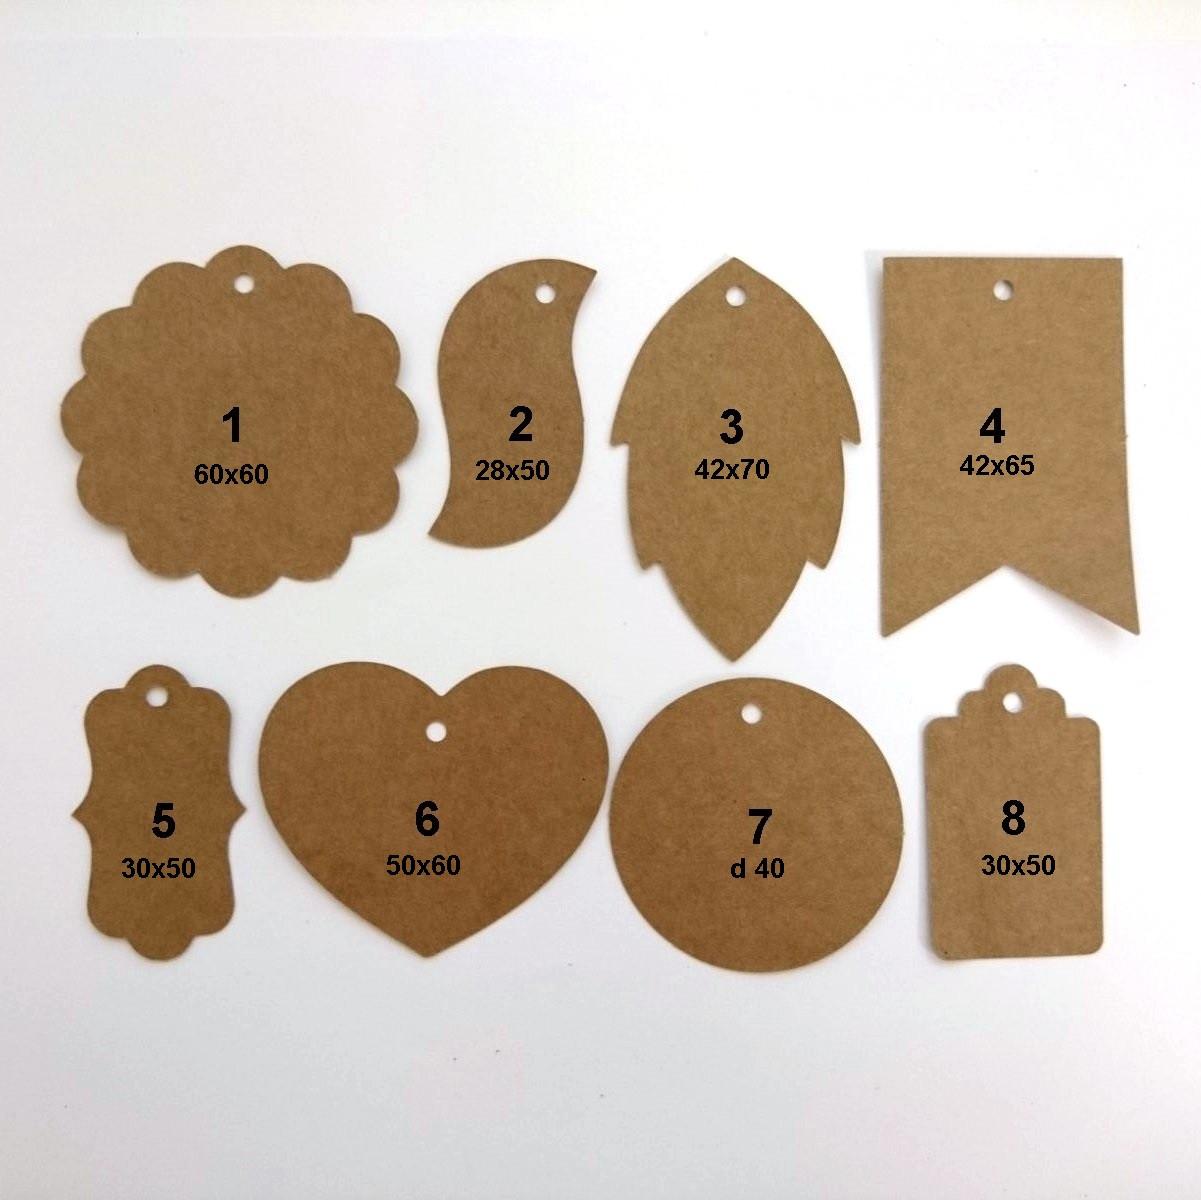 Декор, бірки з екокрафт картона, крафт етикетки